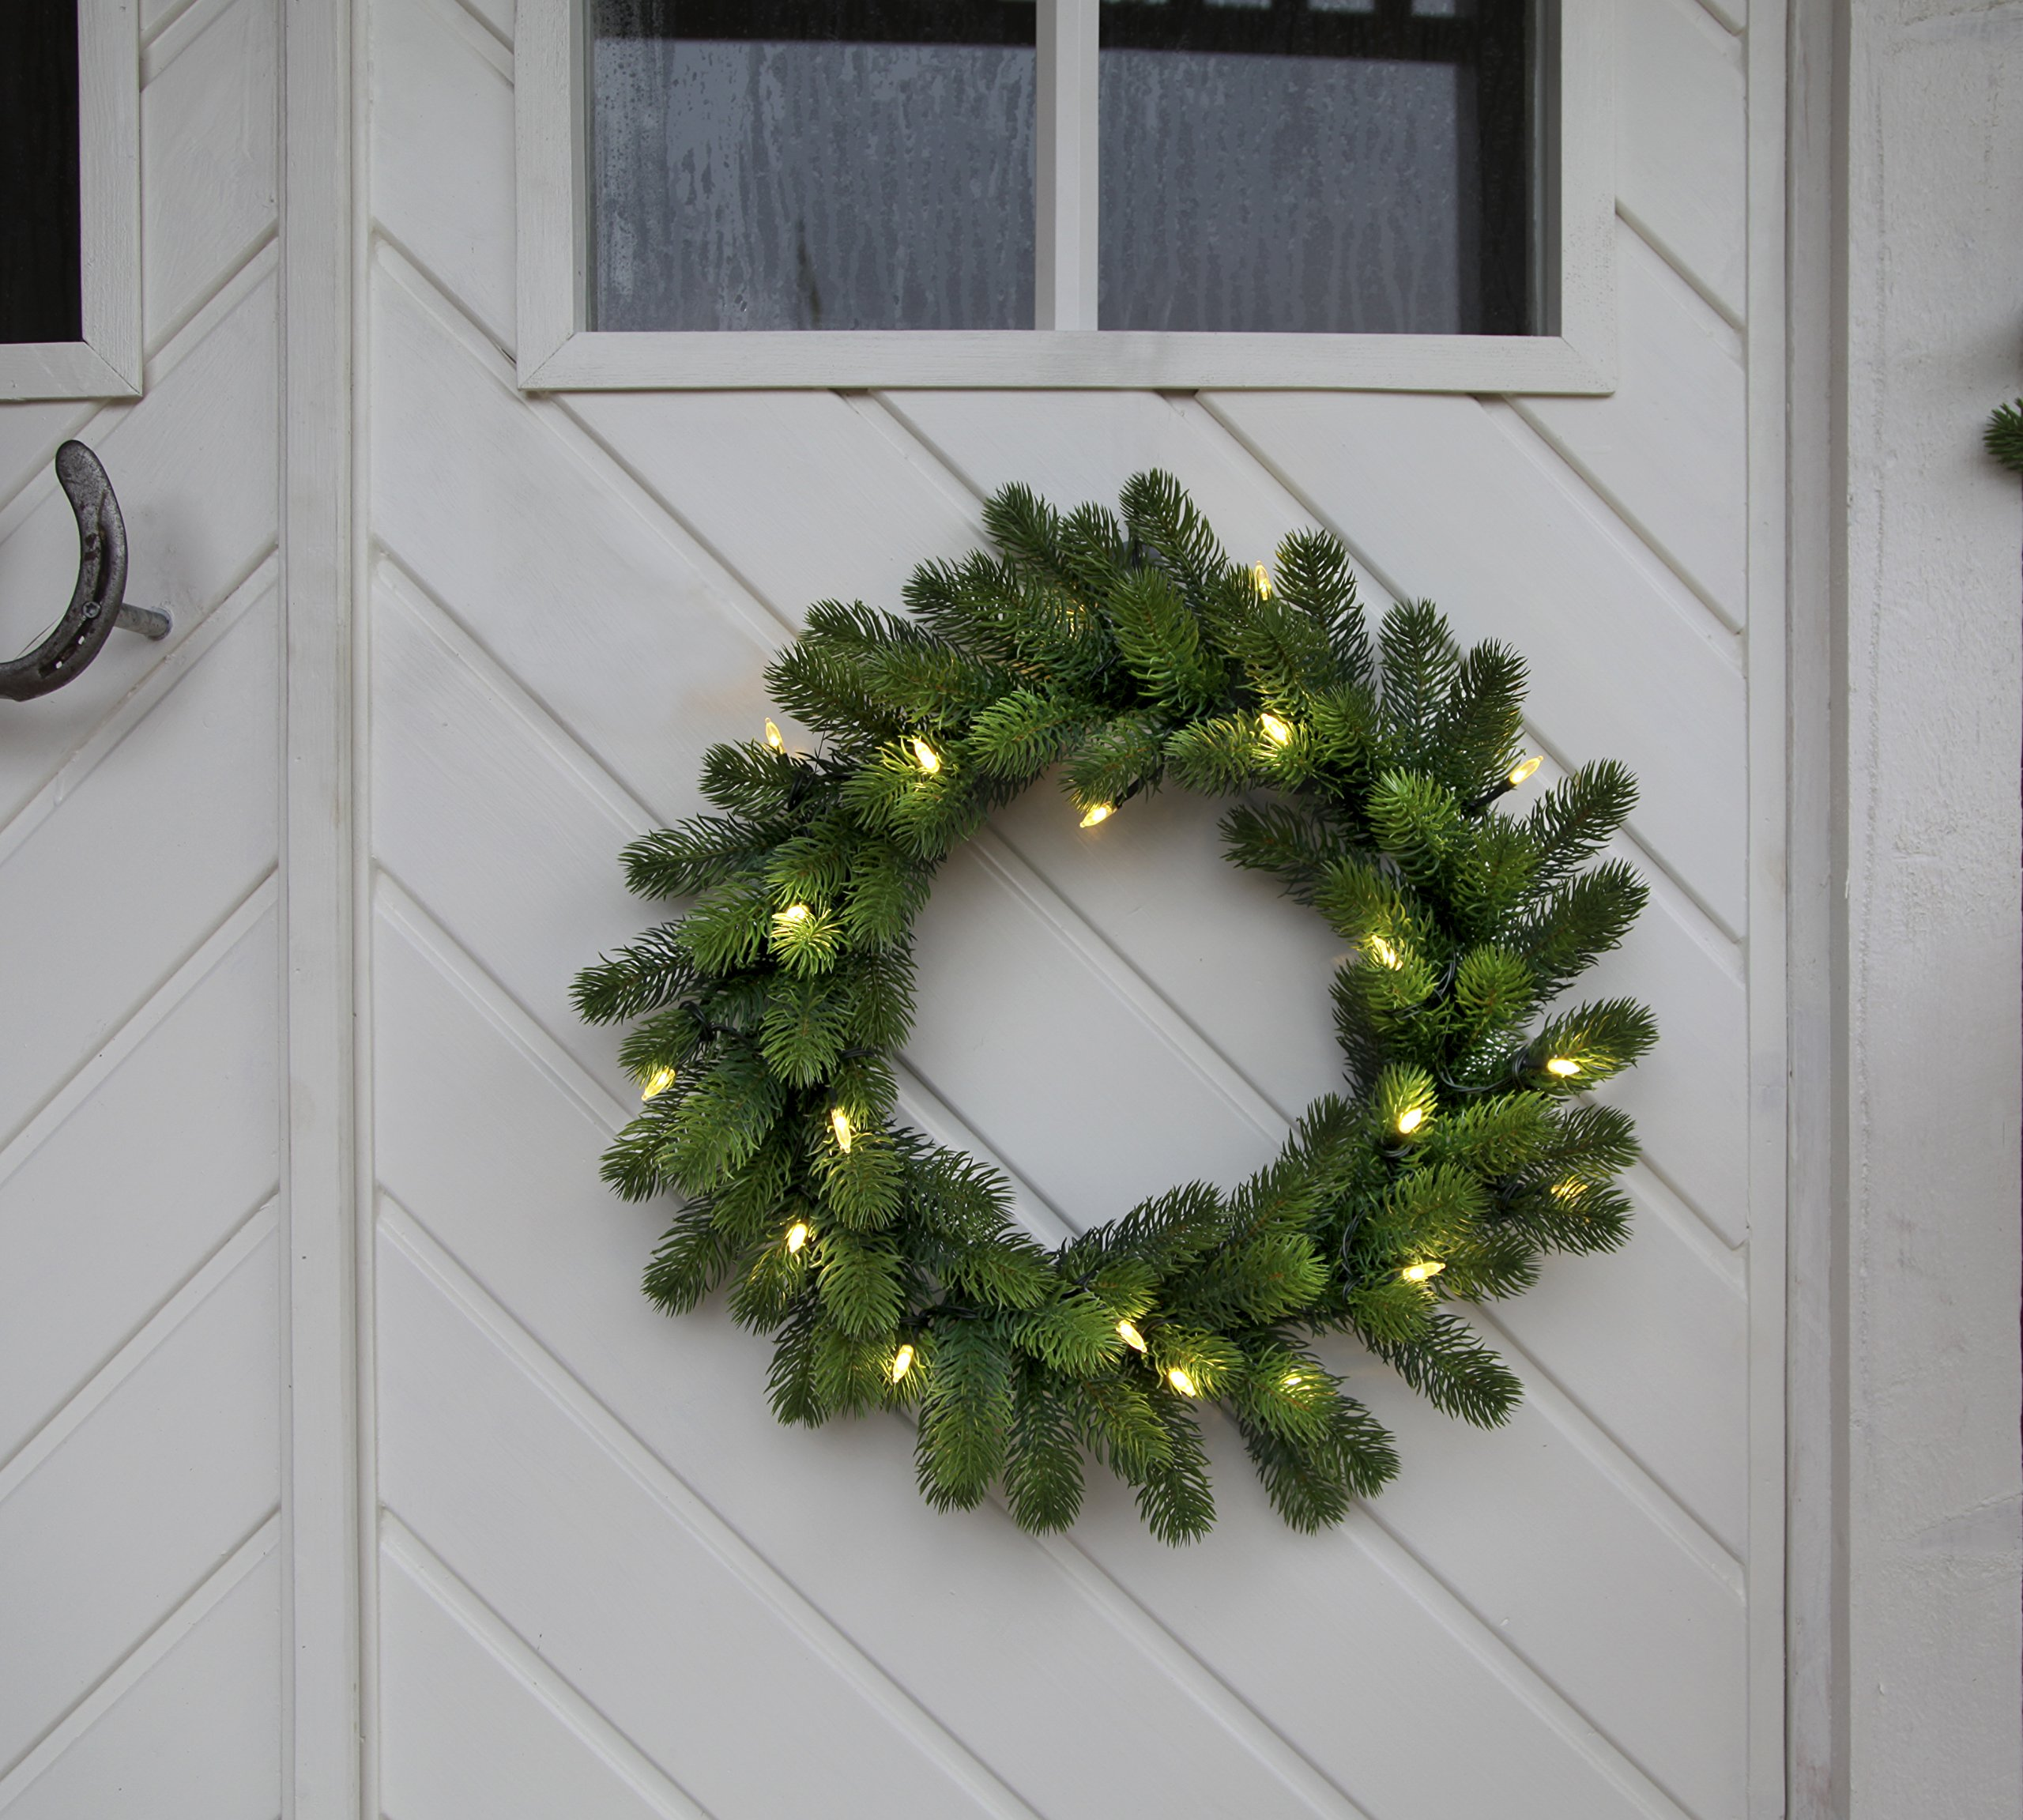 Star-LED-TannenkranzOrsa-beleuchtet-20-warmwei-Pisello-LED-outdoor-Trafo-Karton-Durchmesser-40-cm-612-70